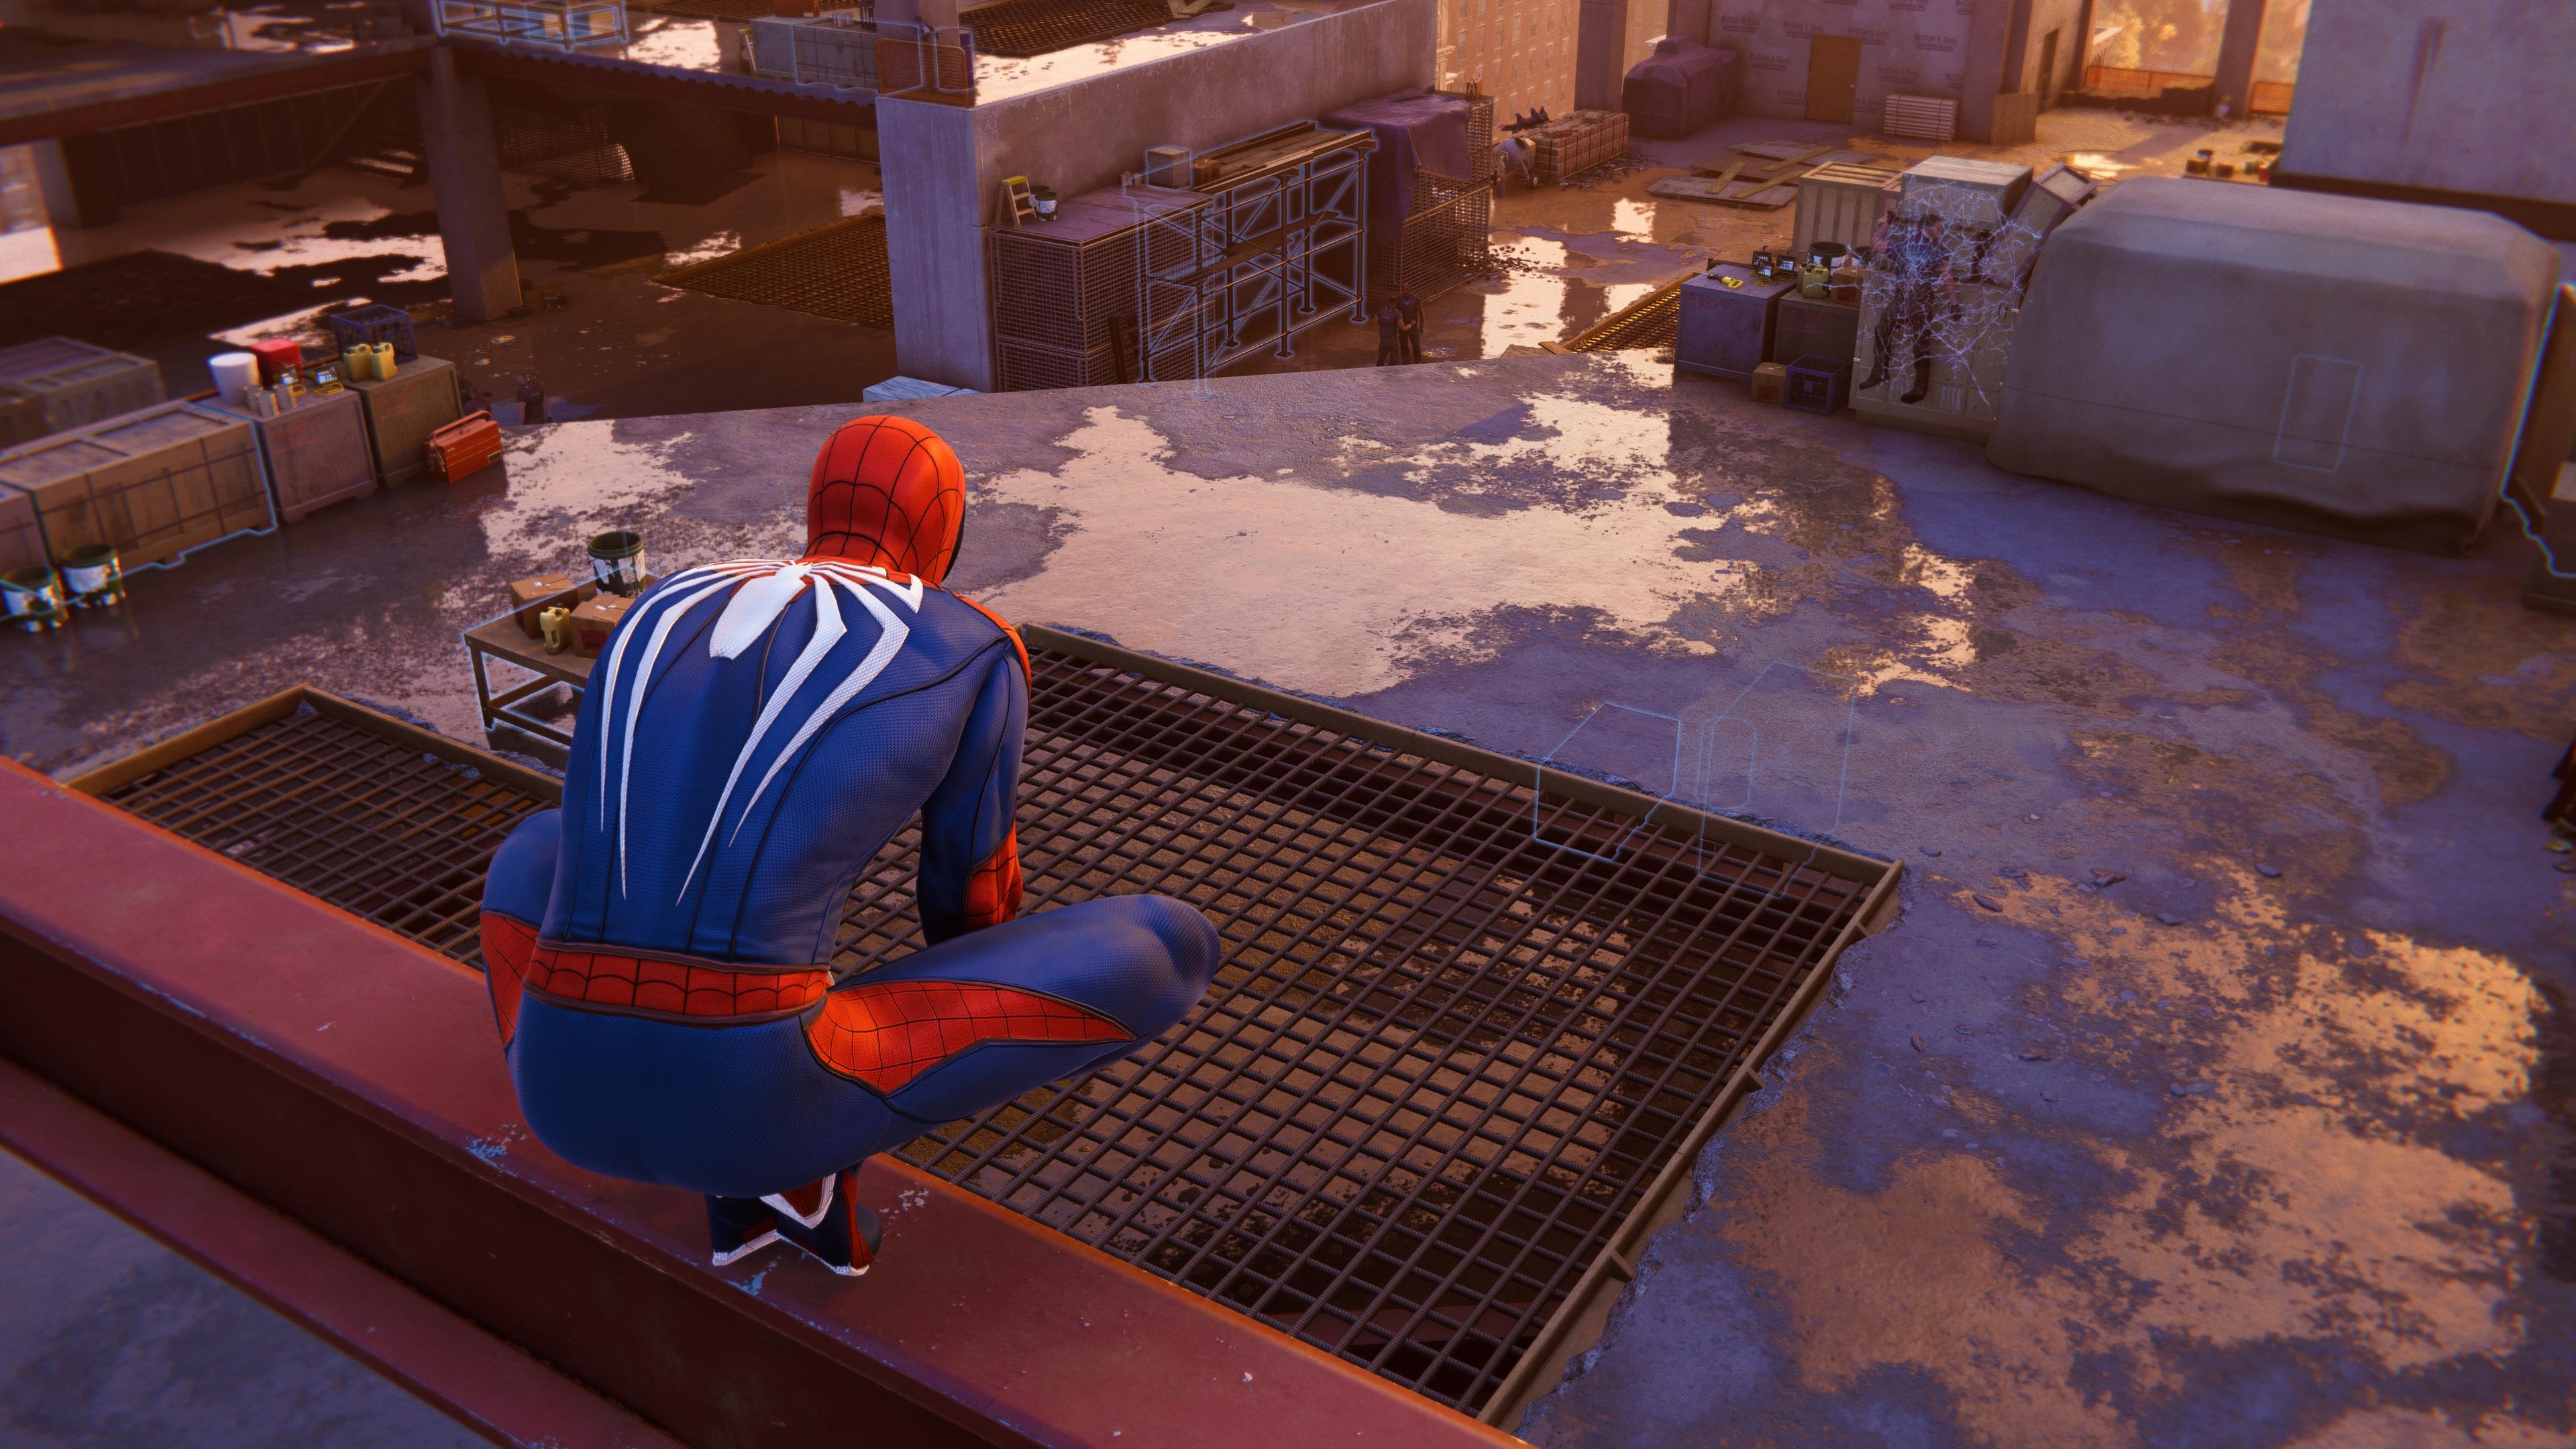 https://i.ibb.co/47cG9Nv/Marvel-s-Spider-Man-Remastered-20210511200549.jpg